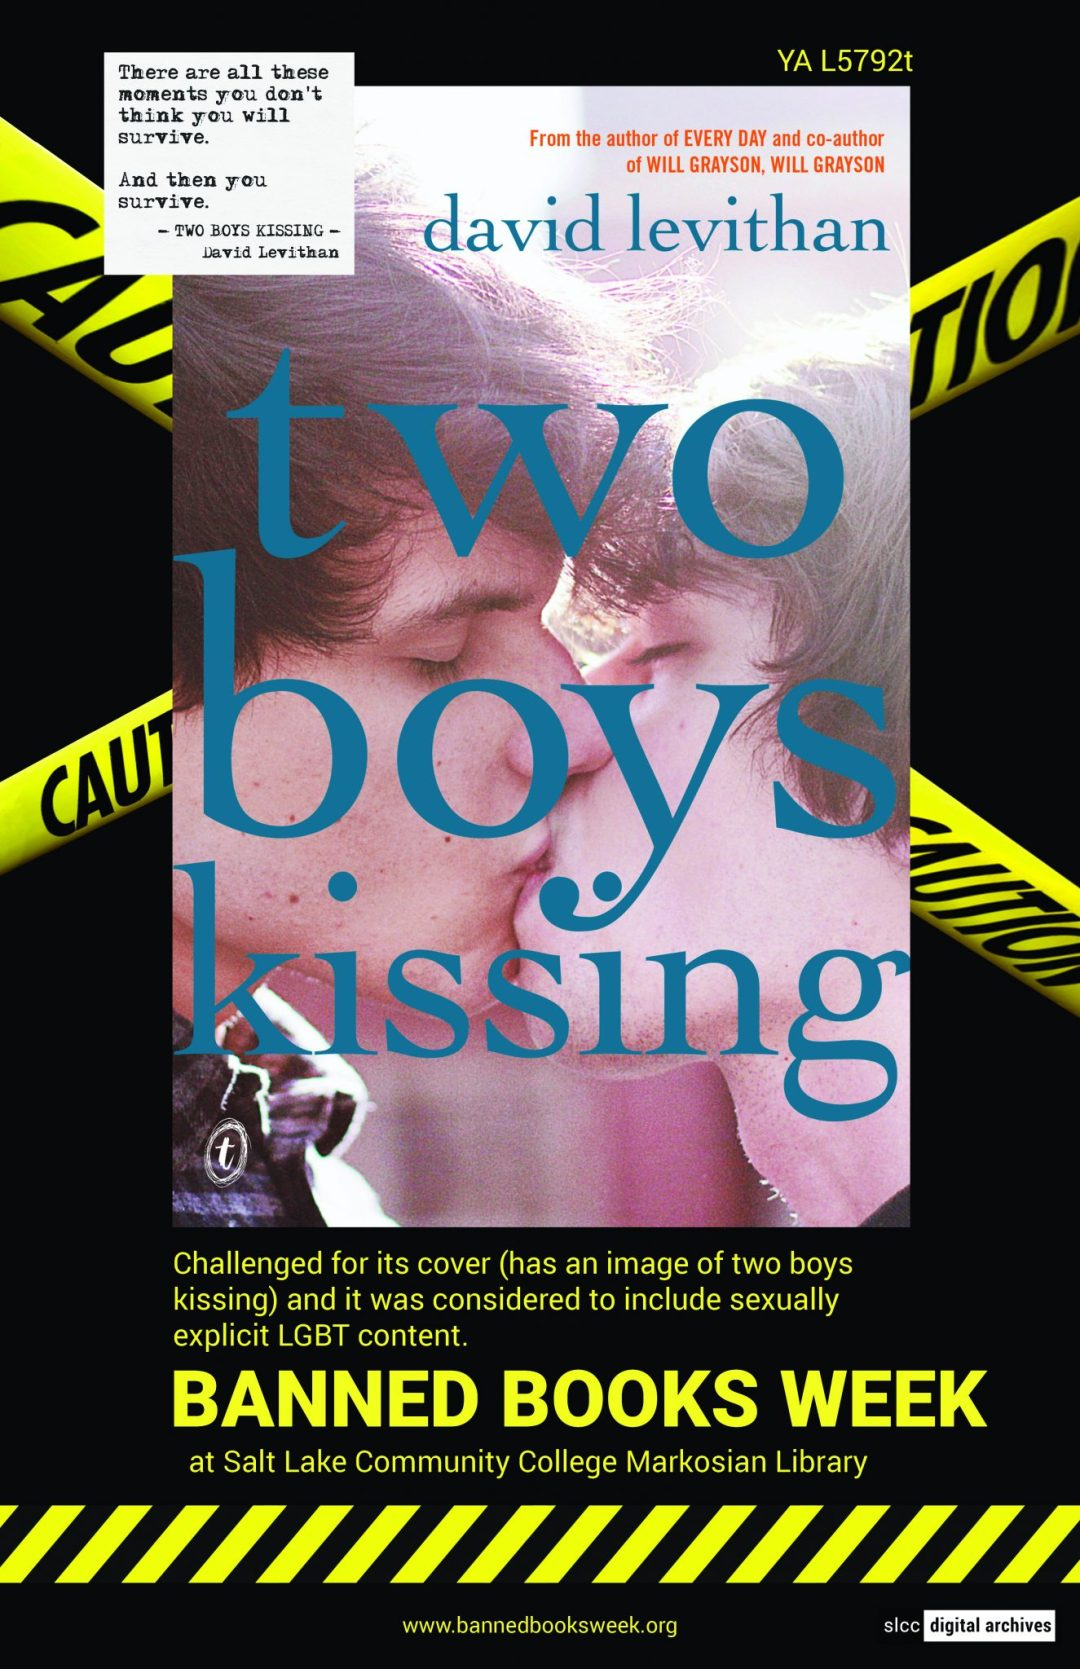 Banned Books Week Poster: Boys Kissing written by David Levithan